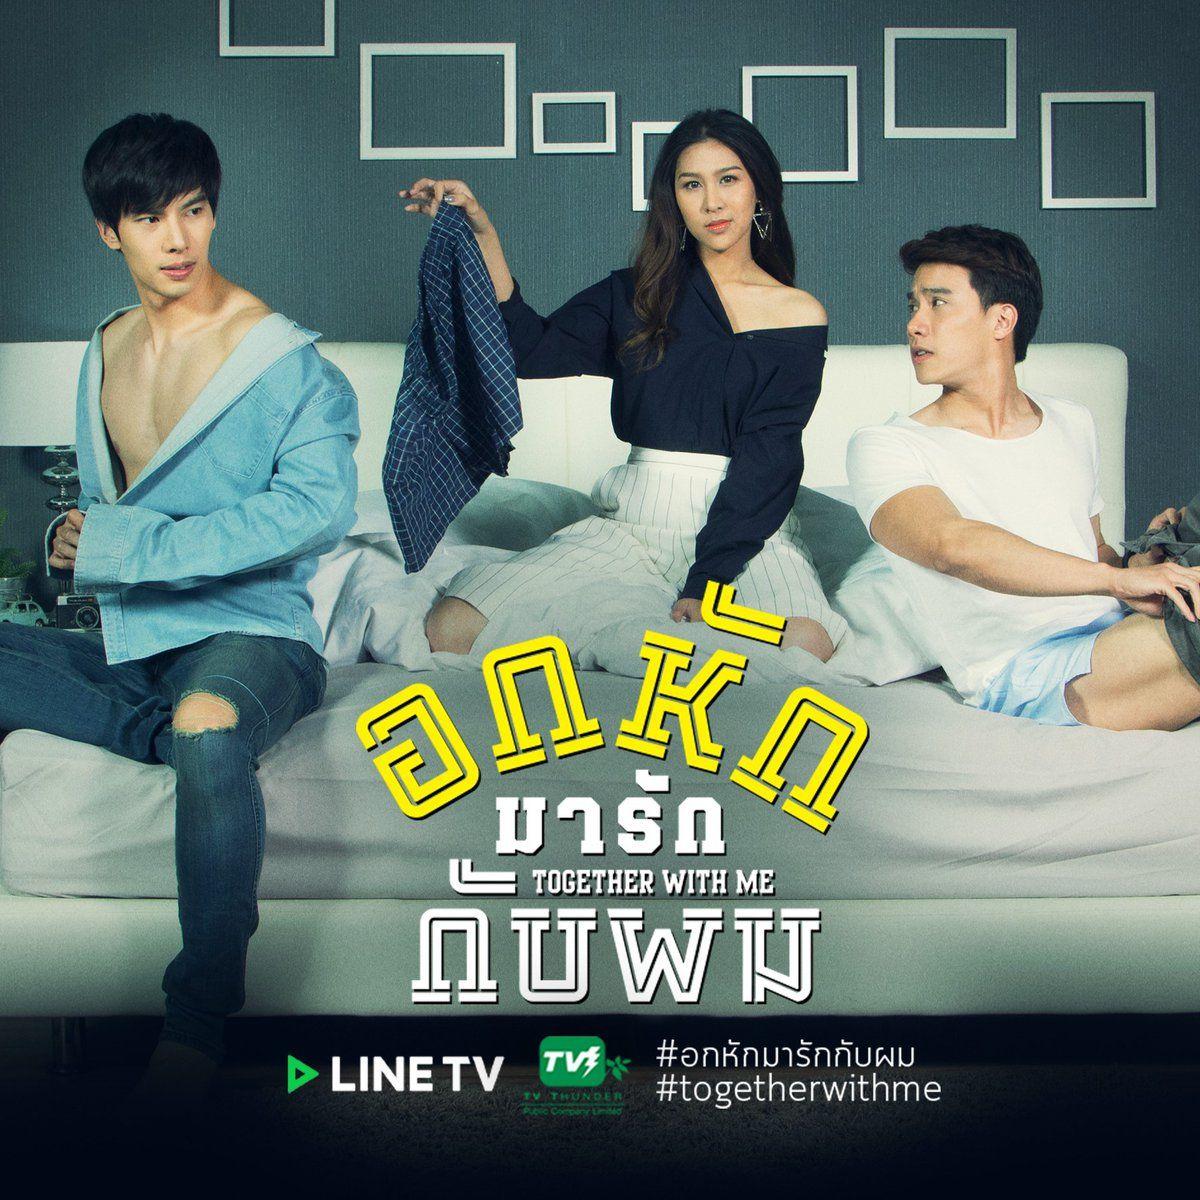 Together With Me Wallpaper Con Imagenes Dramas Coreanos Drama